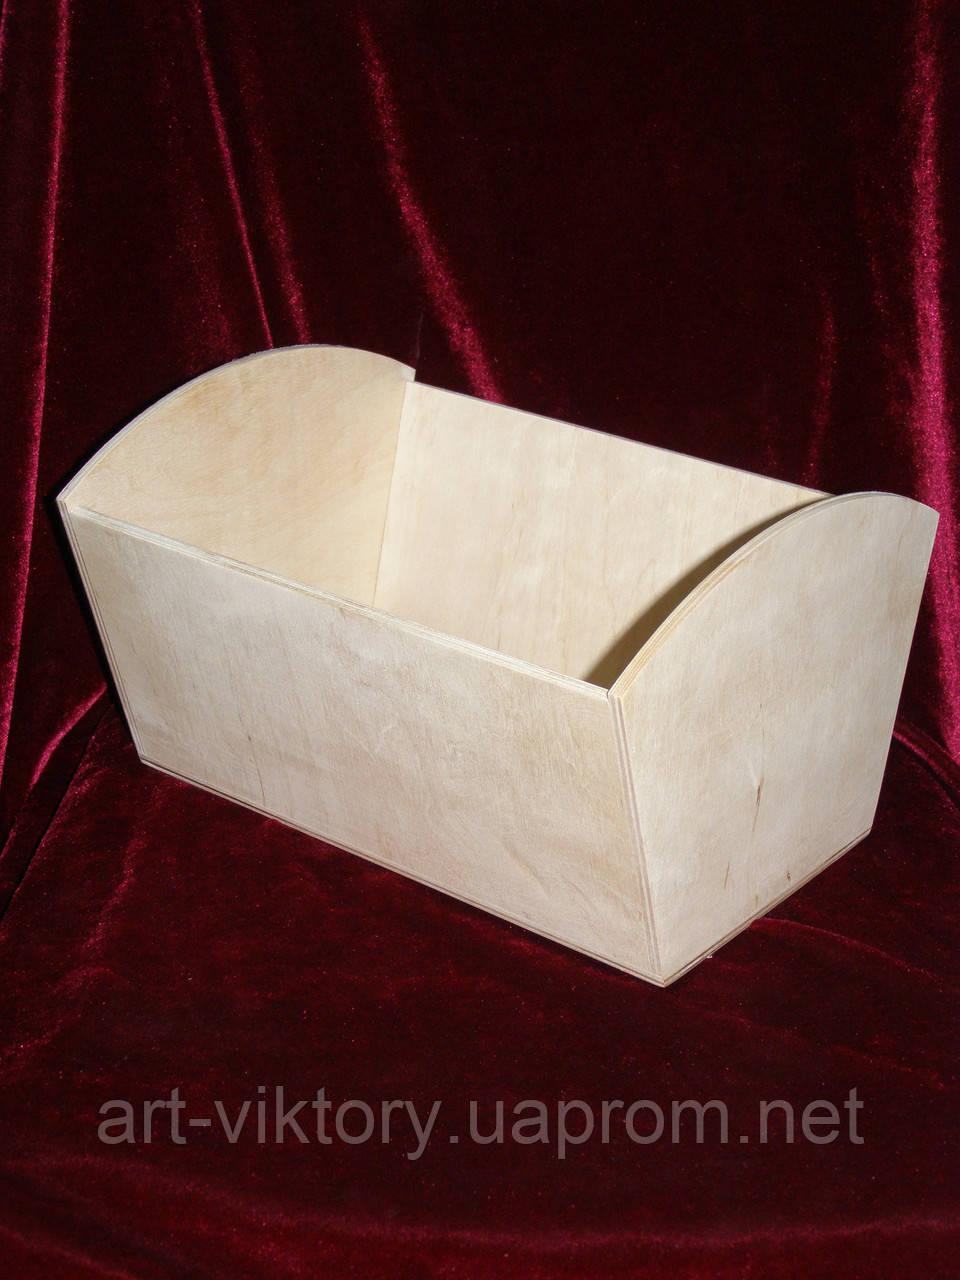 Хлібник. Короб (26,5 х 20 х 15,5 см)